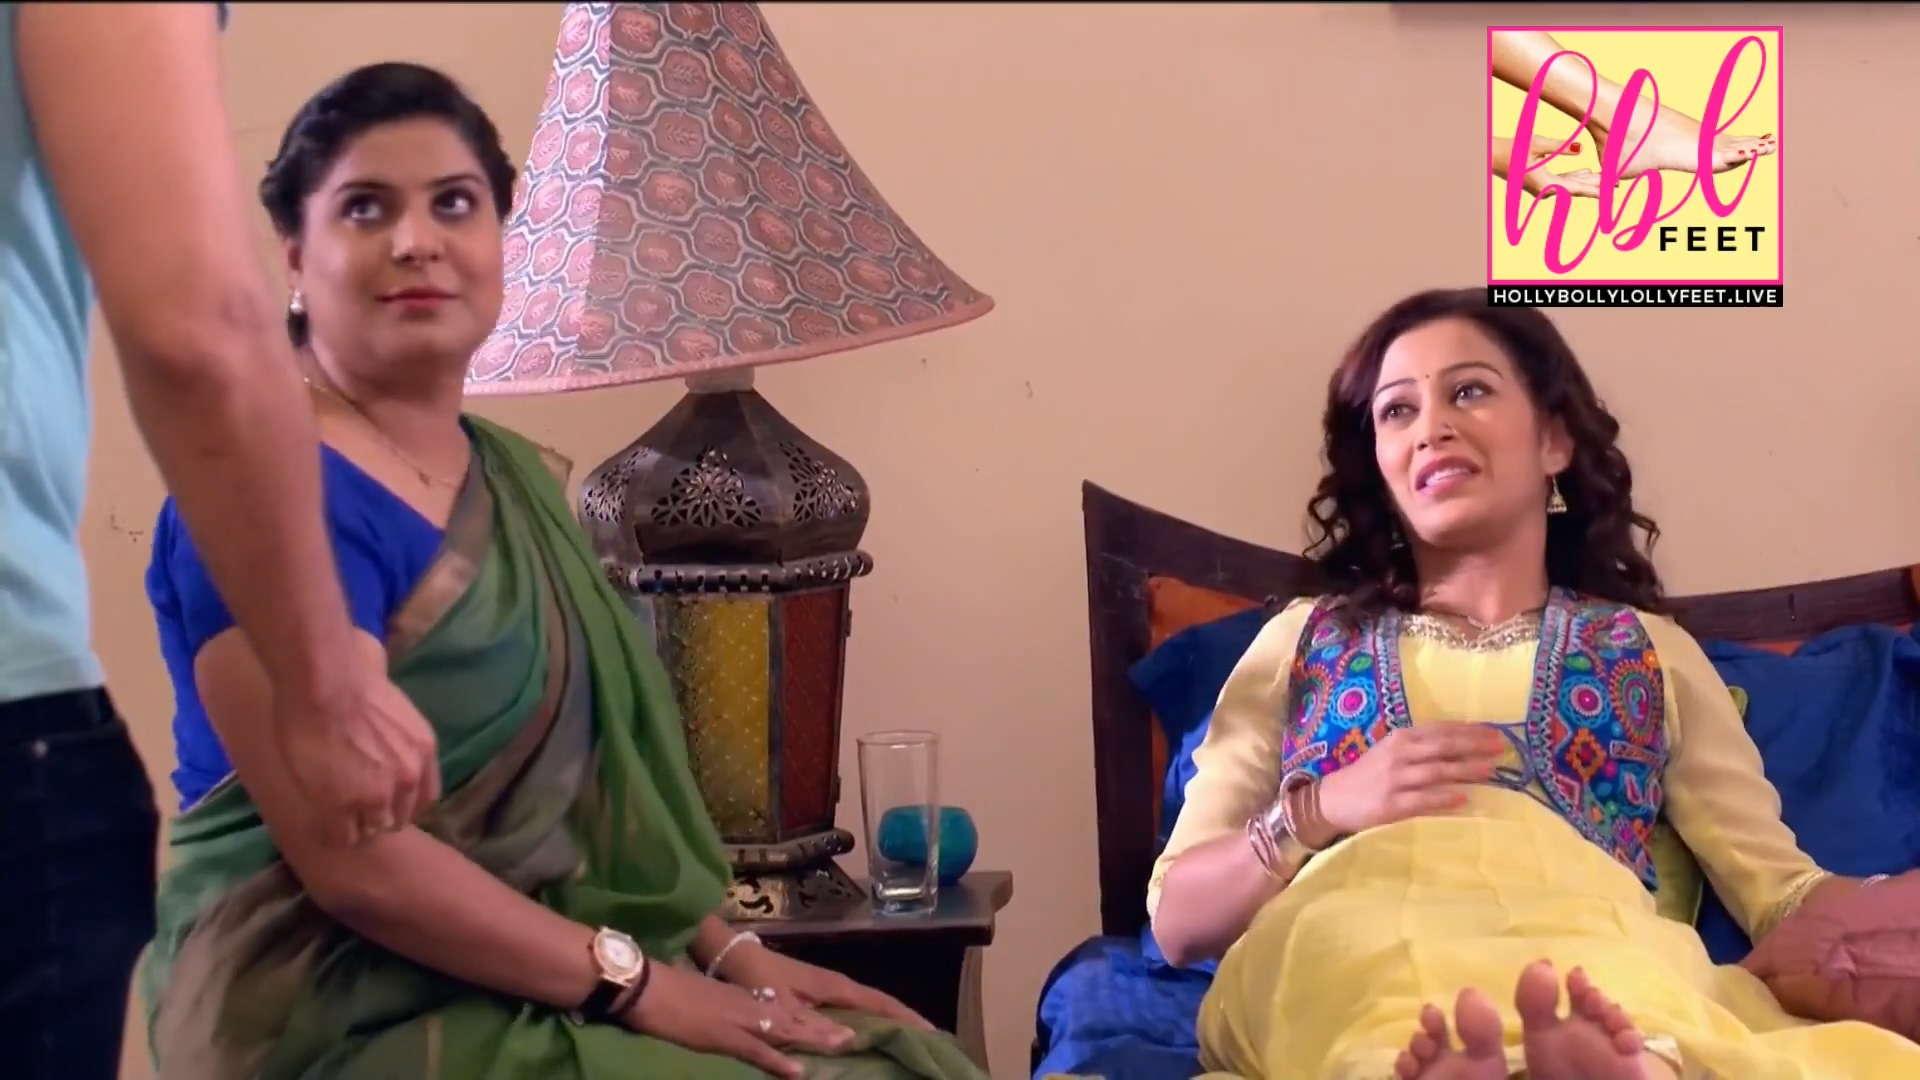 Watch Sunayana Fozdar 2007 video